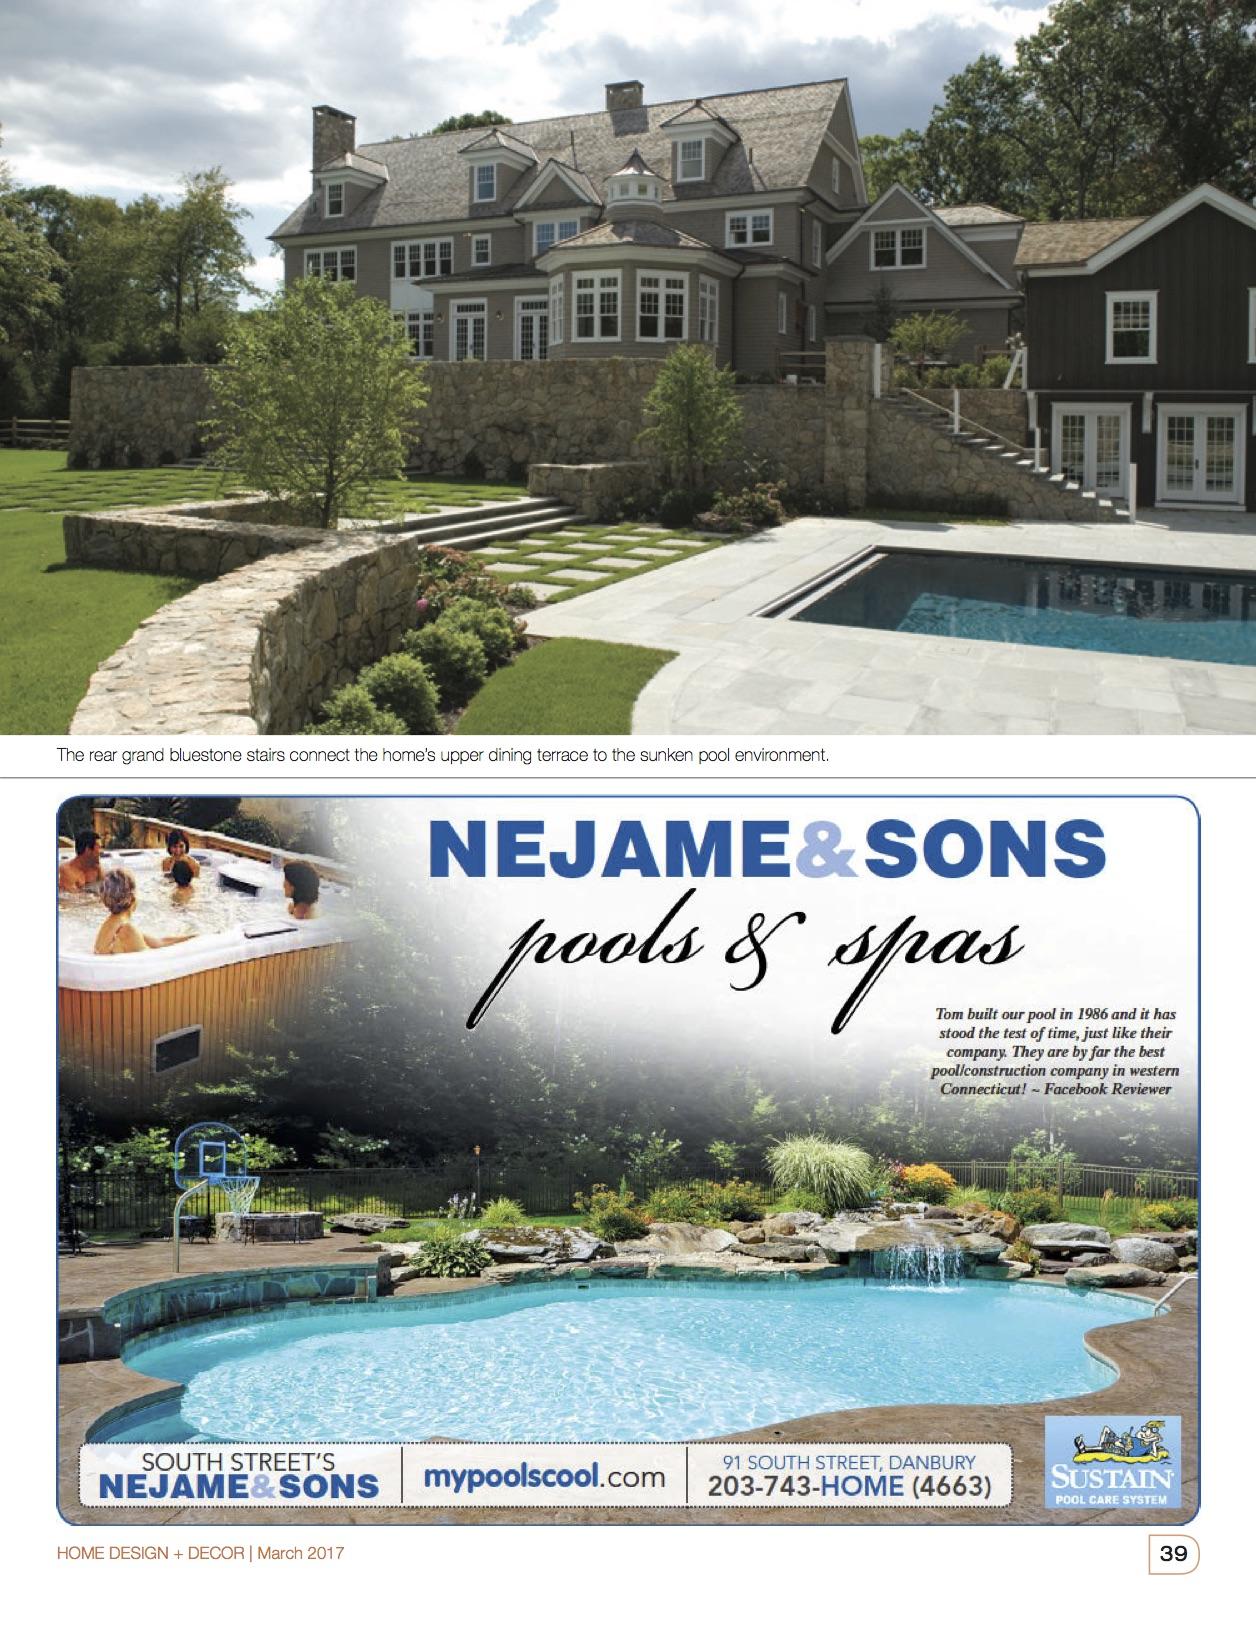 2017 Hearst CT Home Design magazine 39.jpg